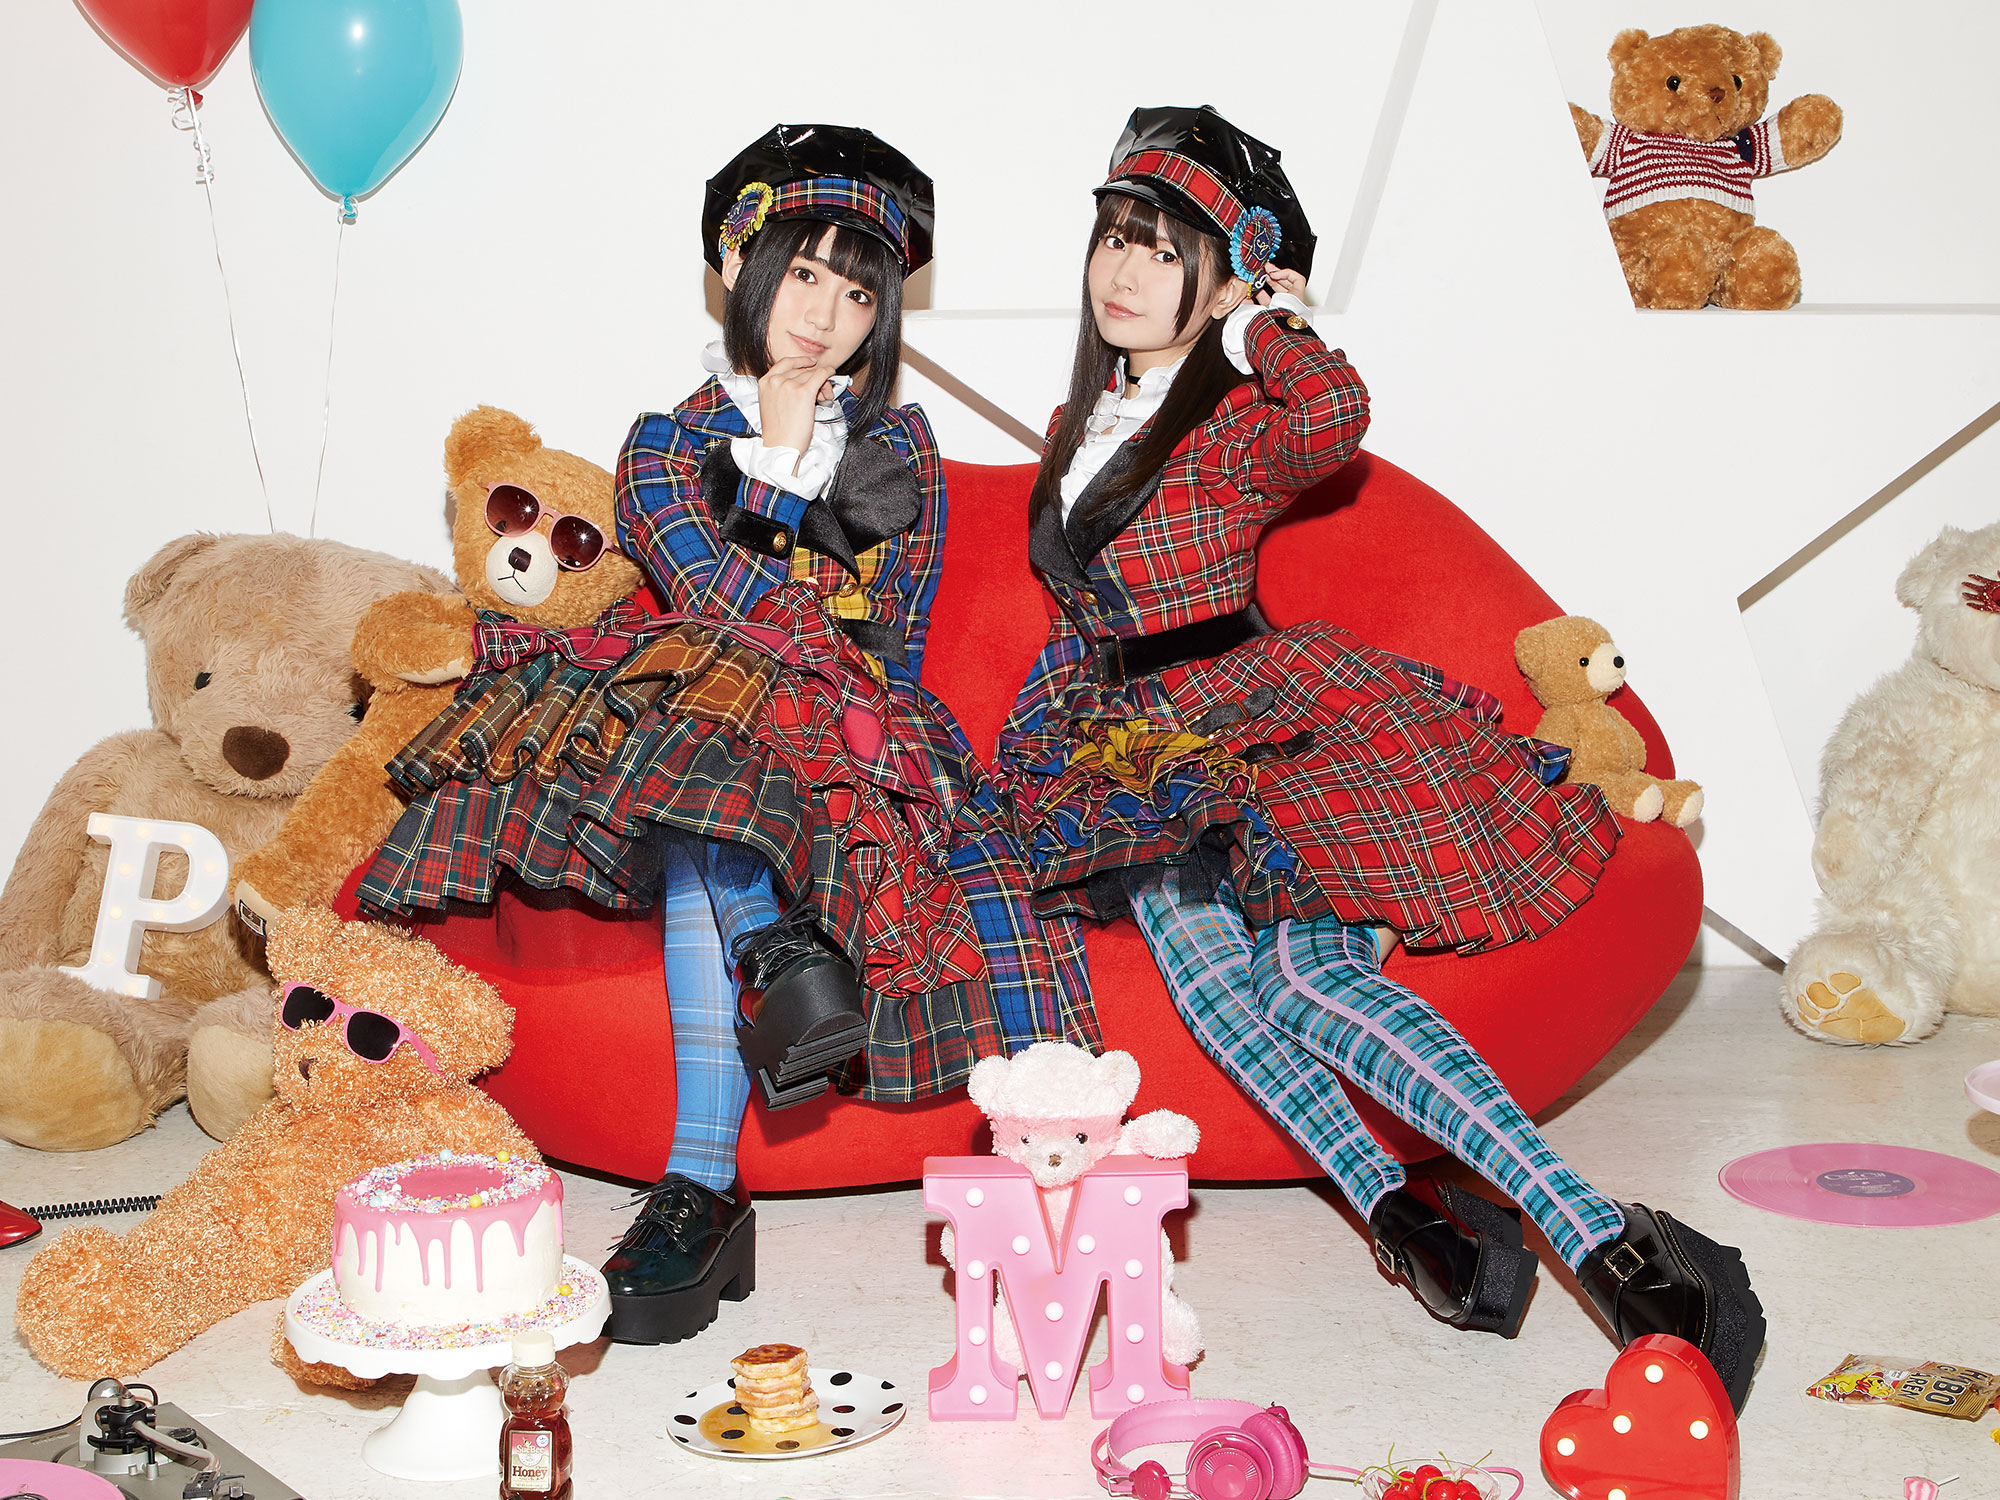 petit milady 5thアルバム『Howling!!』リリース記念イベント(第2部)